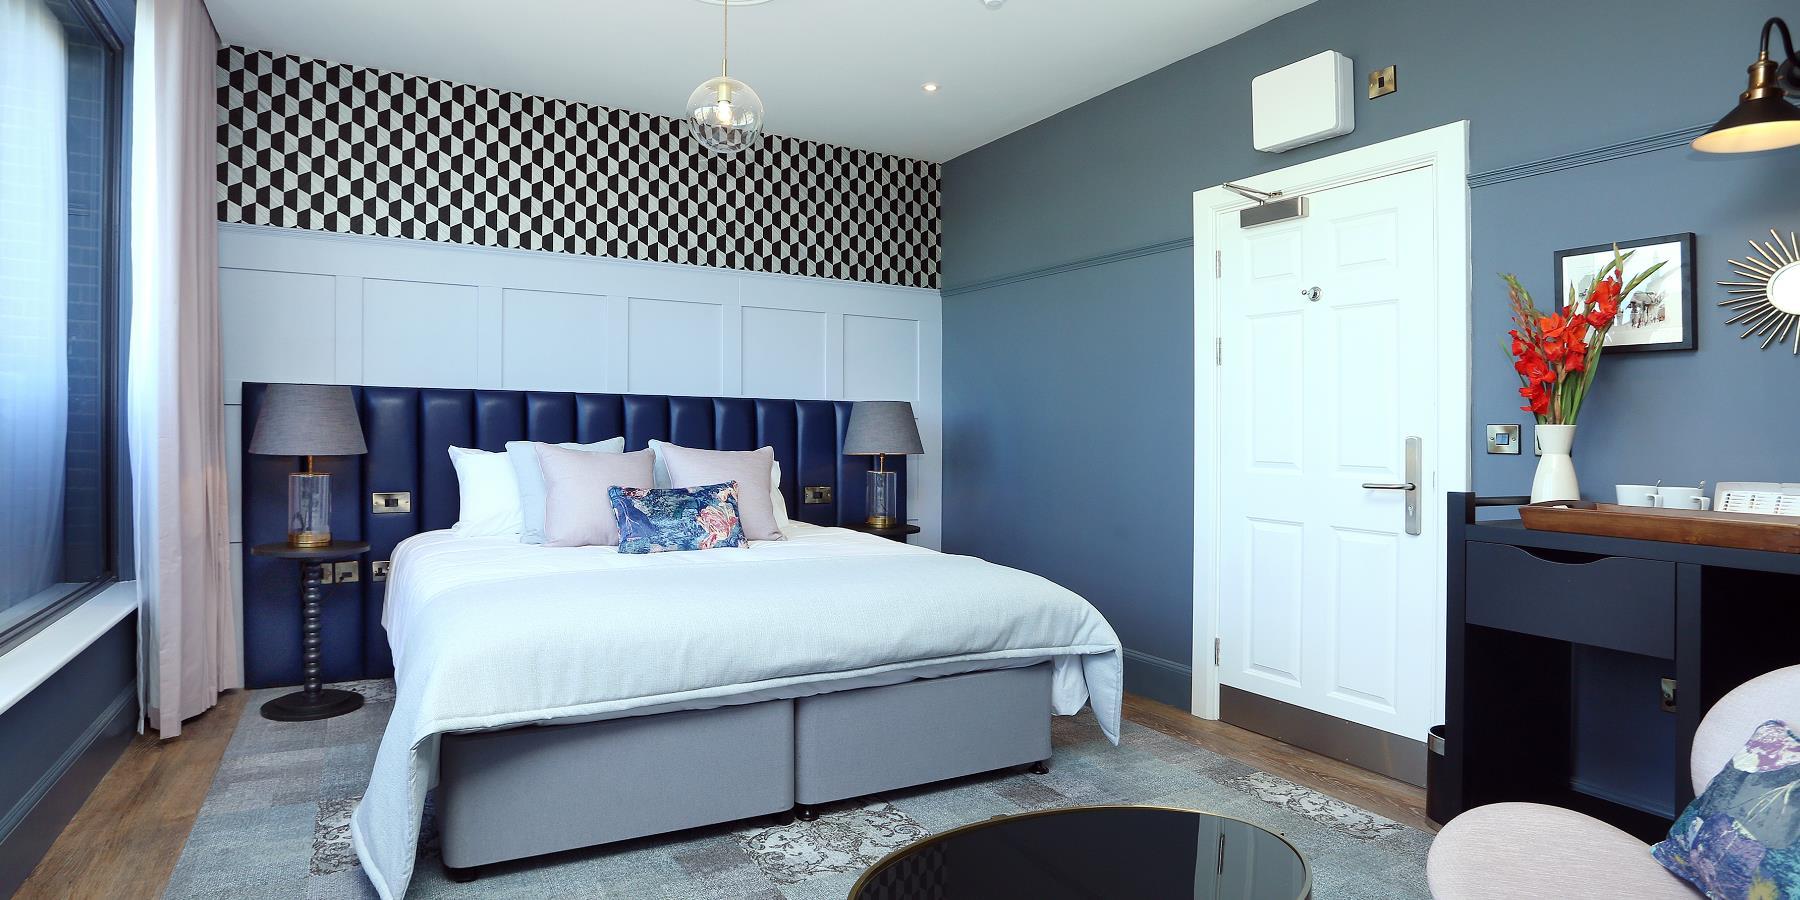 st martins lodge interior of room